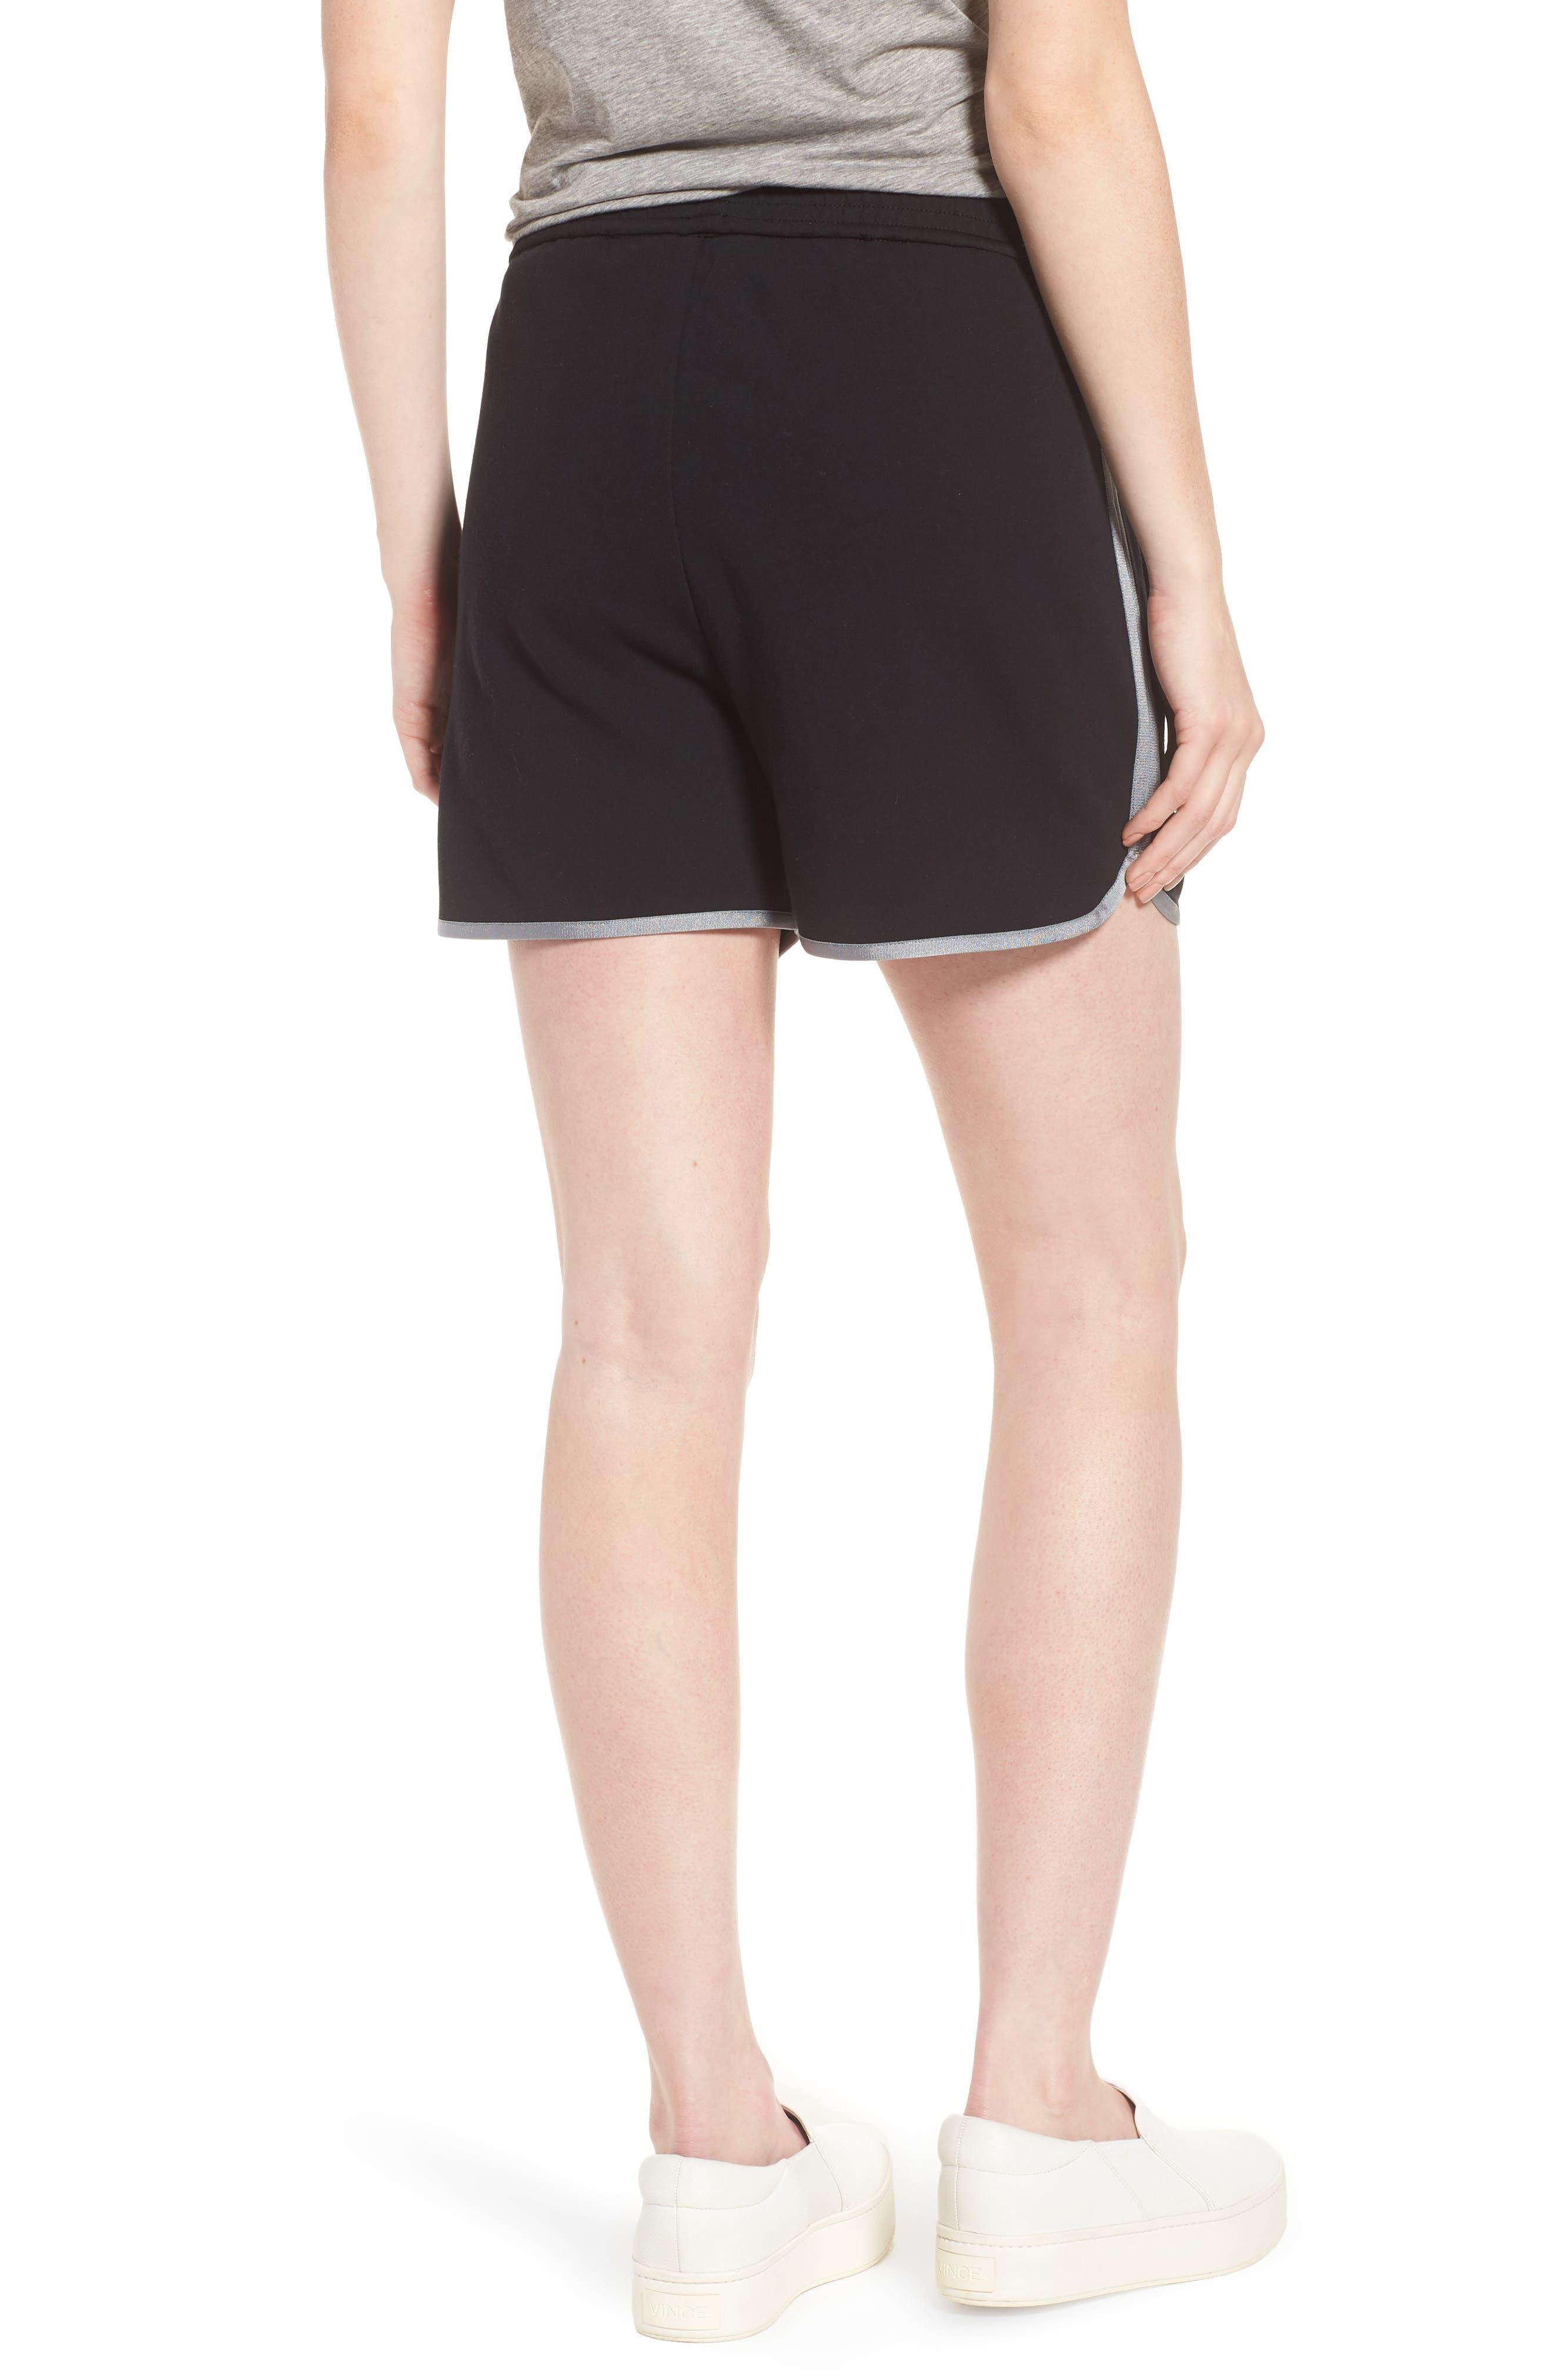 Gym Shorts,                             Alternate thumbnail 2, color,                             BLACK